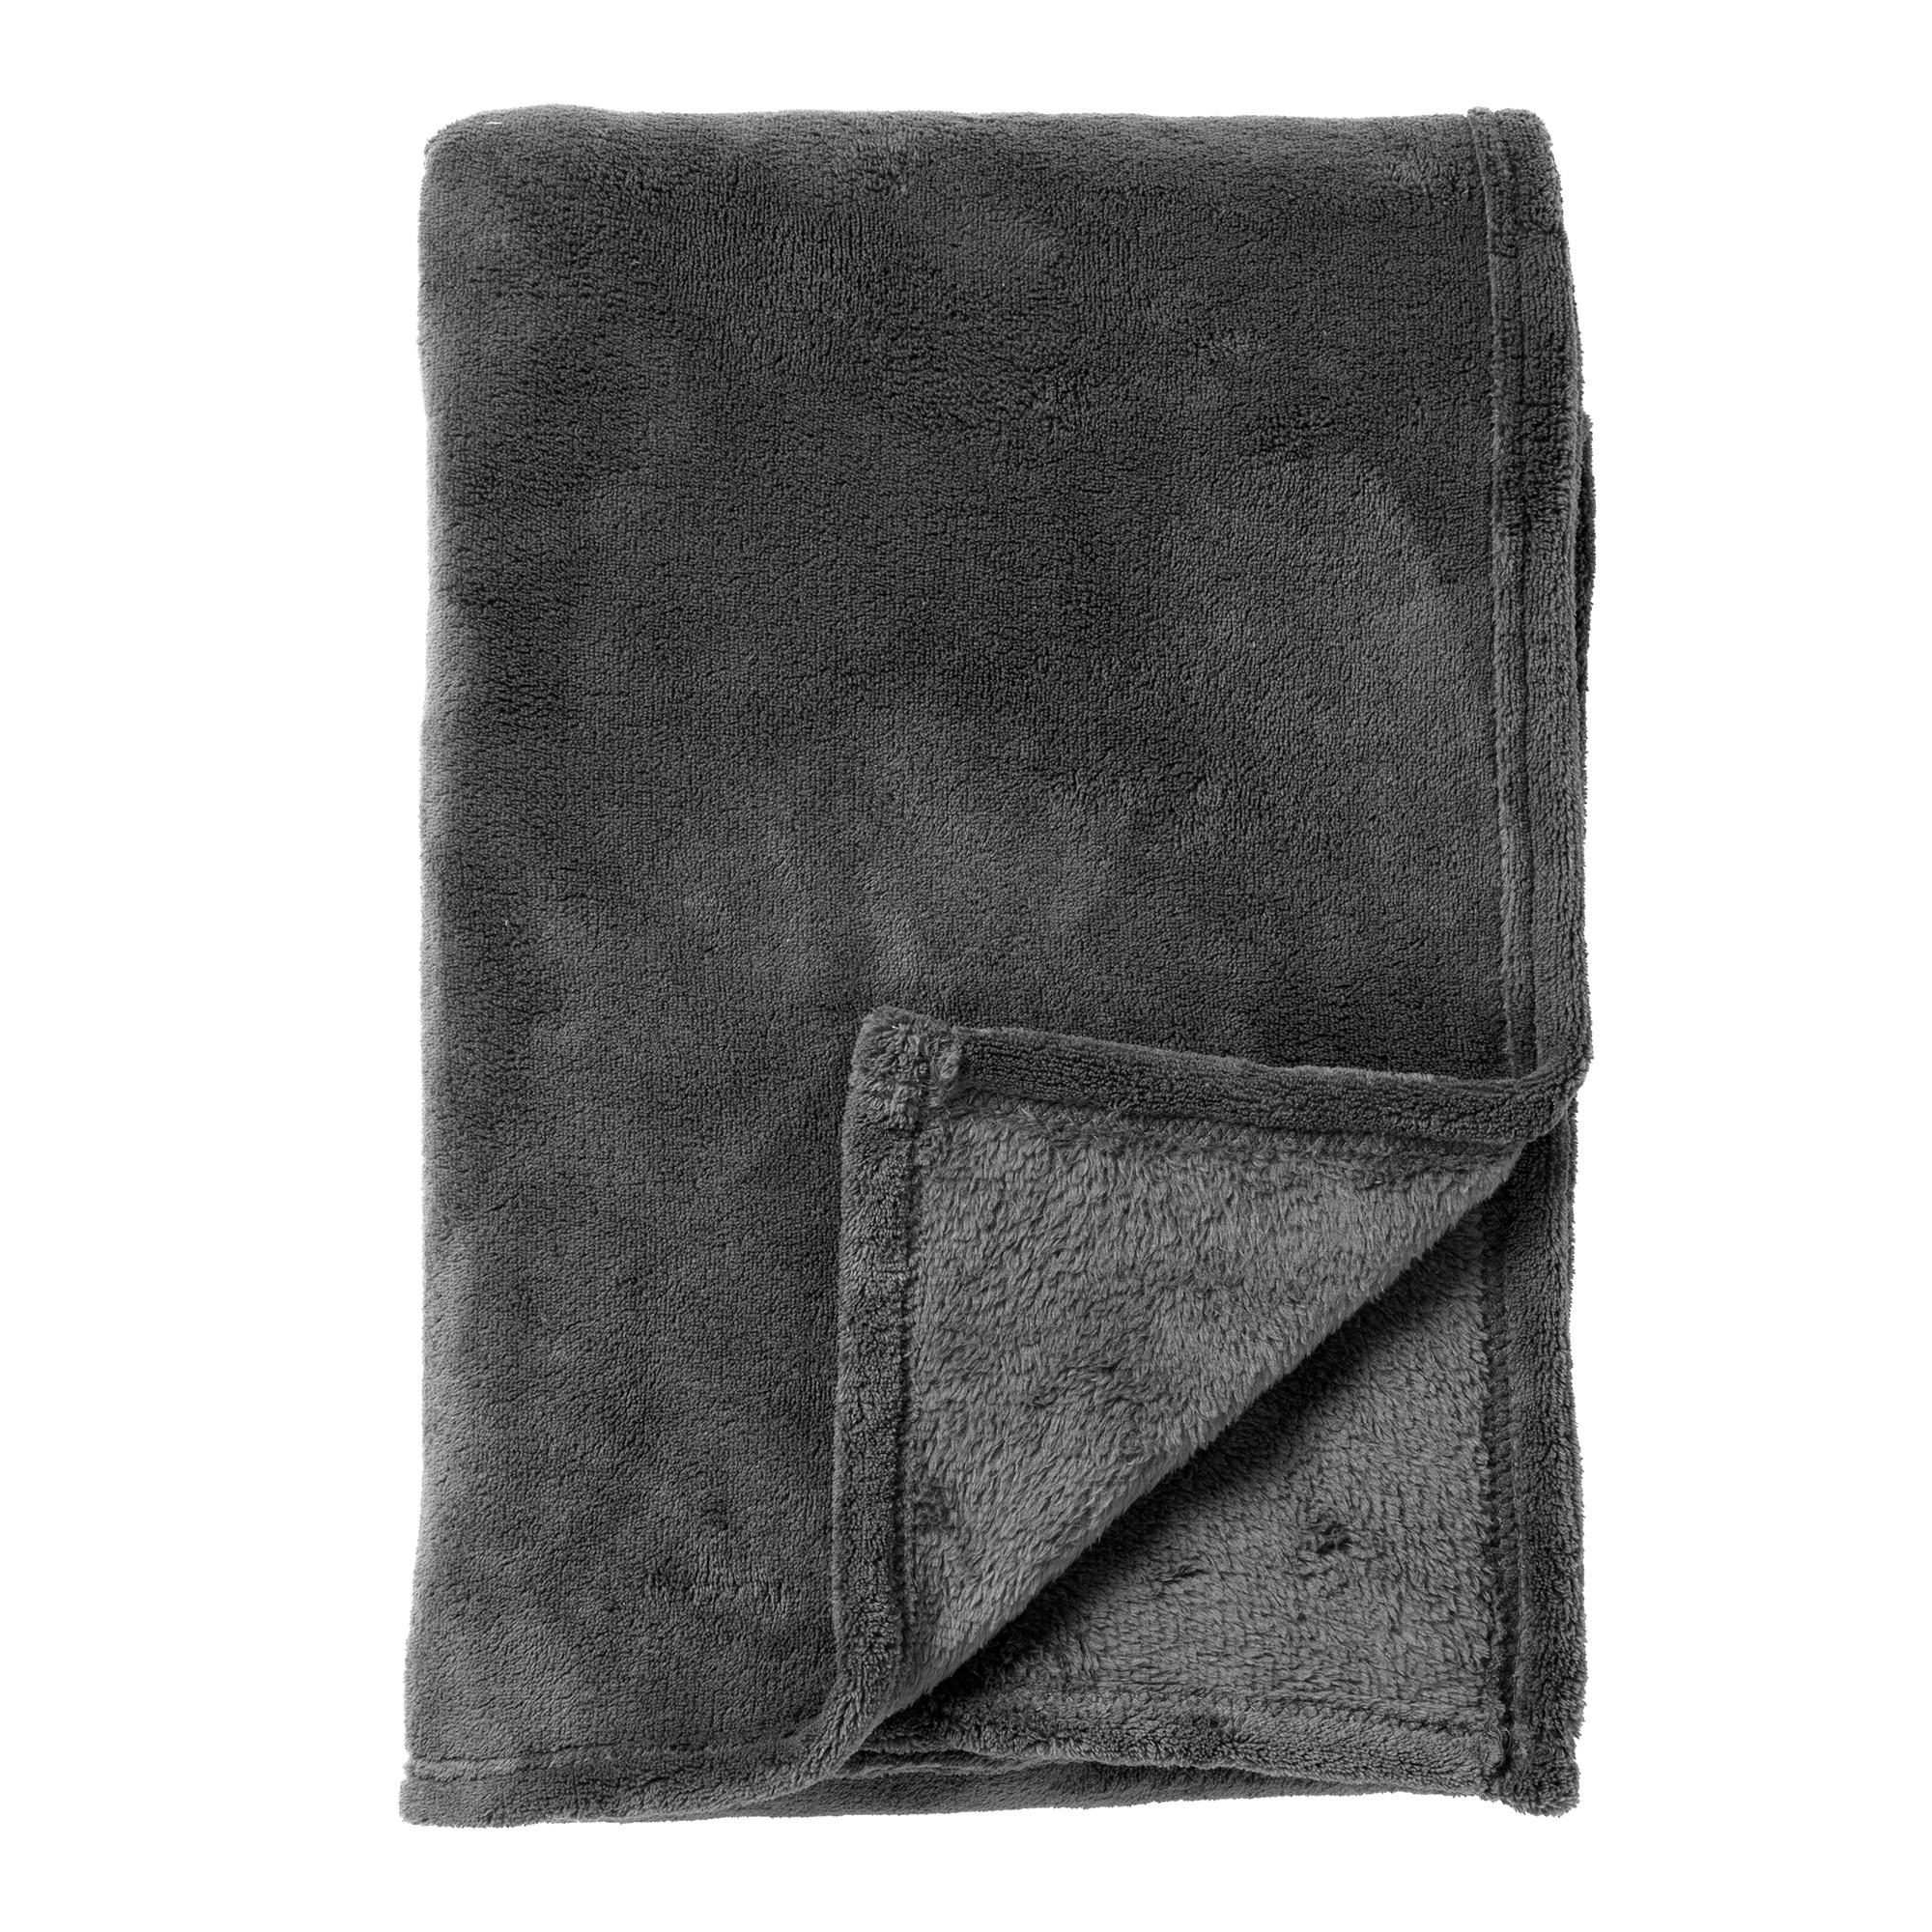 HARVEY - Plaid van fleece Charcoal Gray 150x200 cm